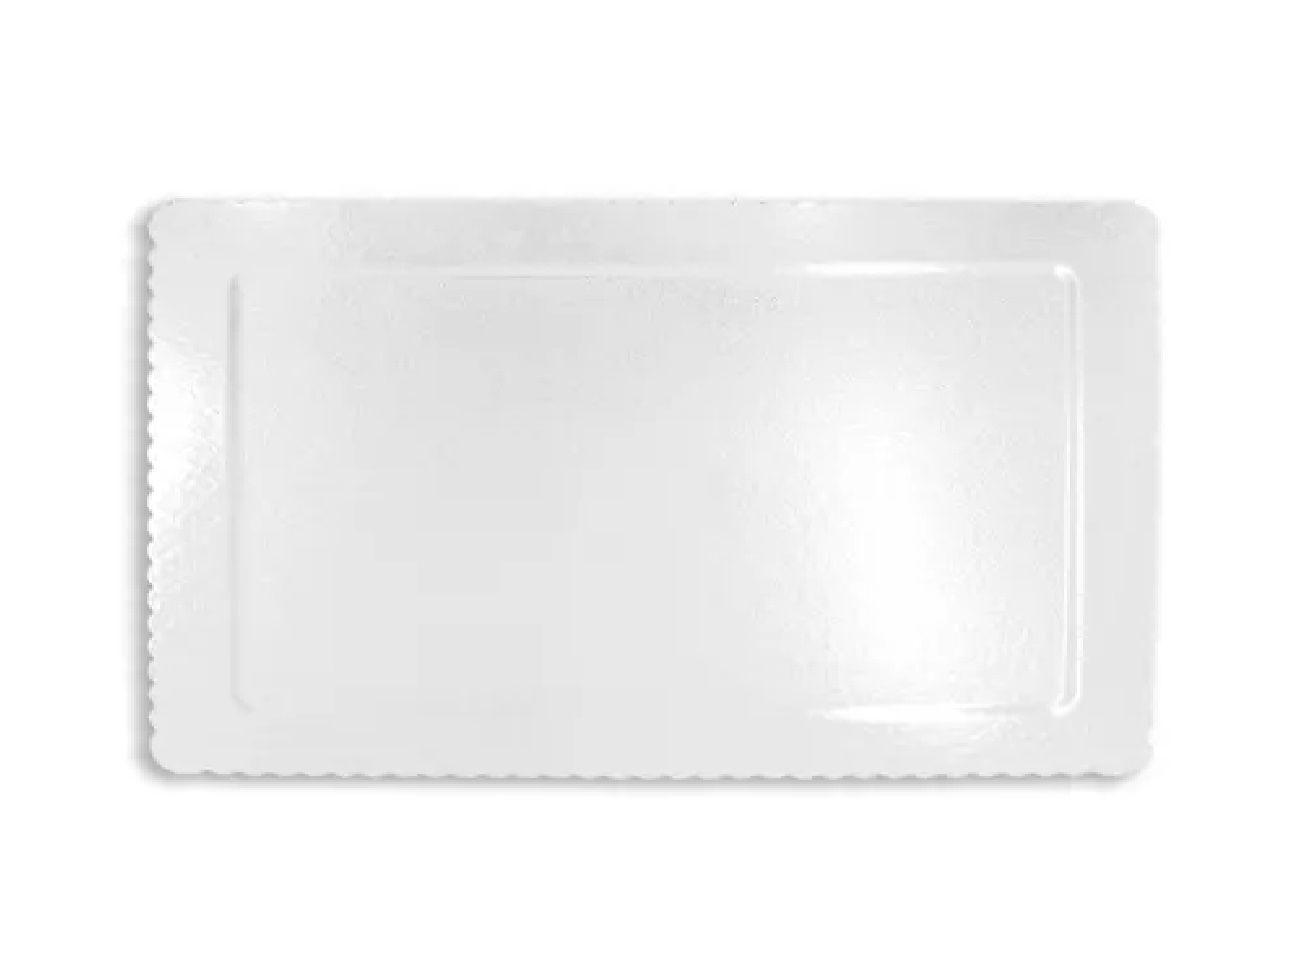 Cake Board Retangular Branco 40x30cm Ultrafest